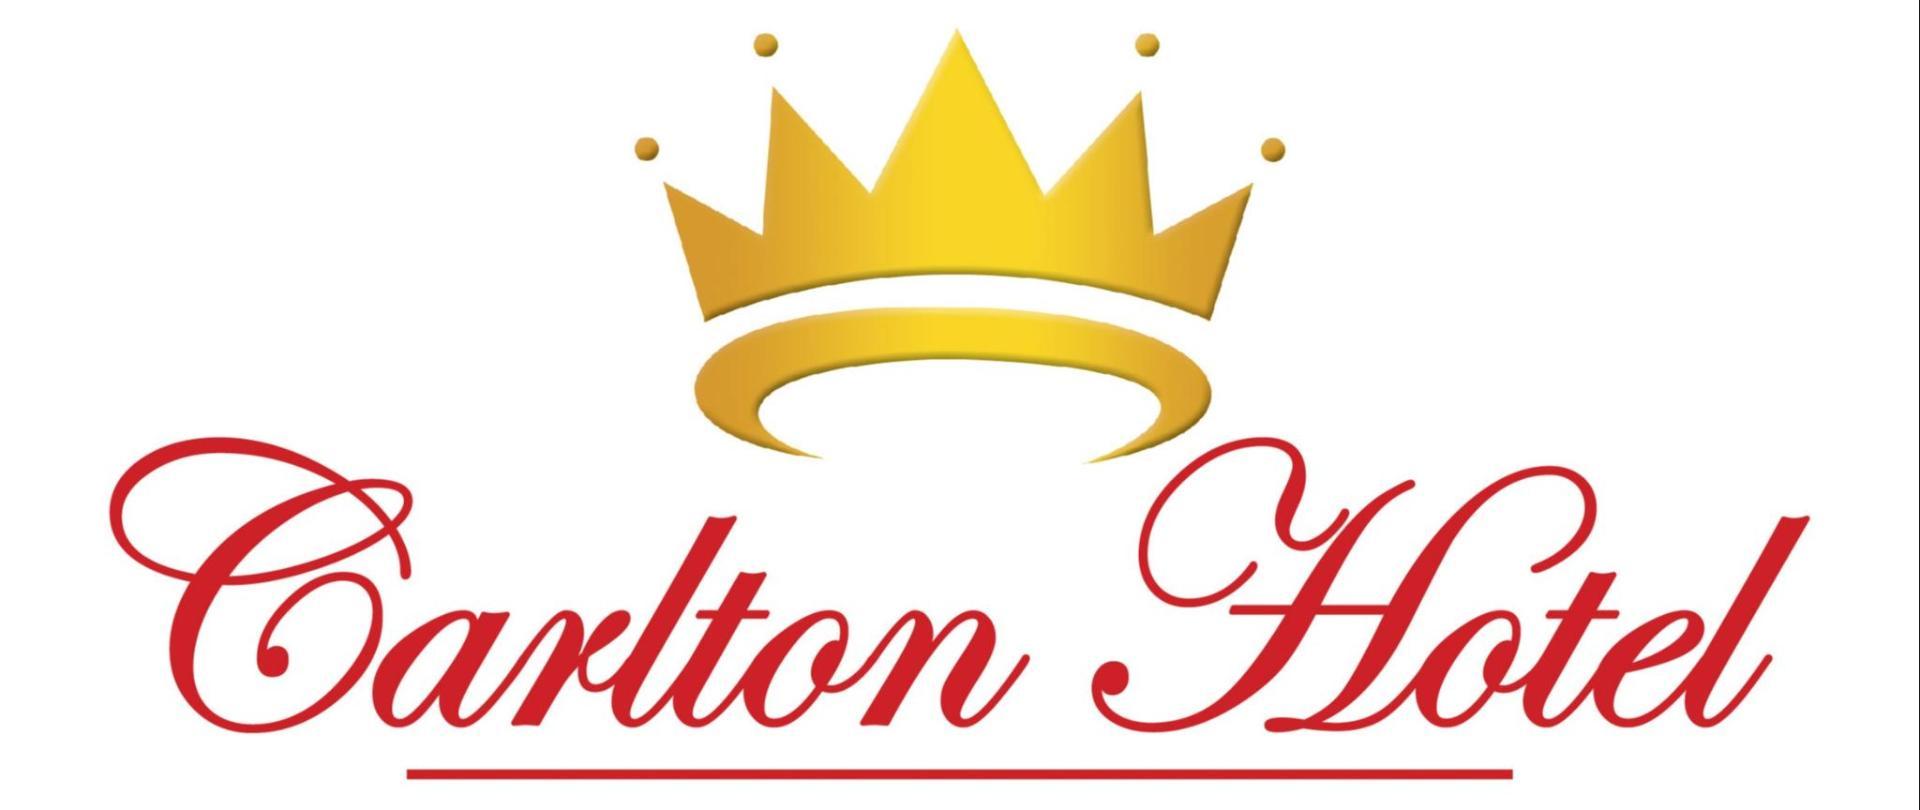 Carlton Hotel_Logo_HiRes.jpg